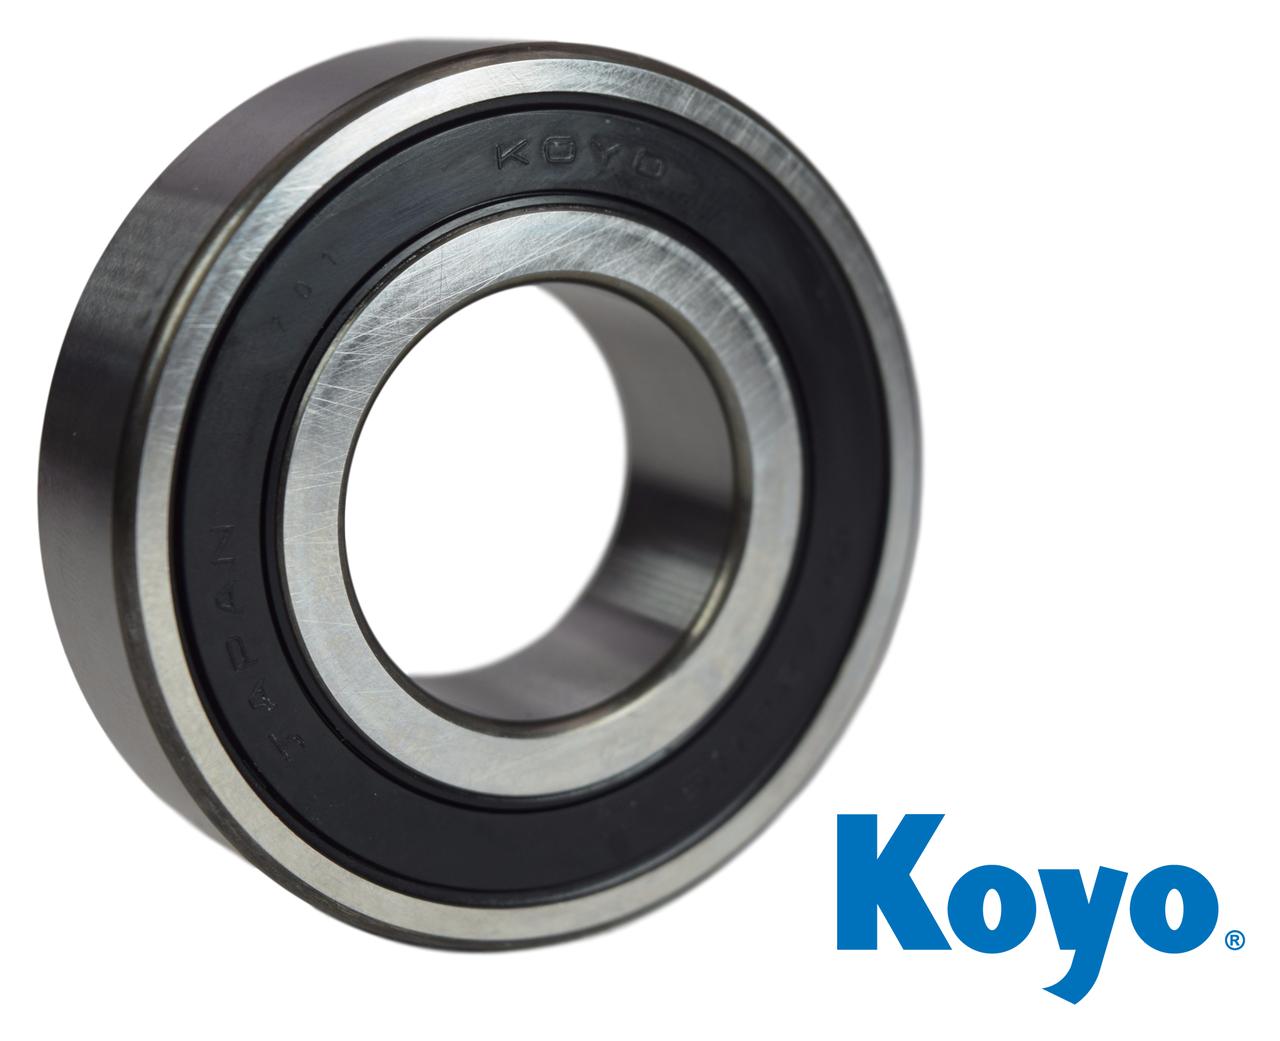 Koyo 62/28-2RSC3 Radial Ball Bearing 28X58X16 Image